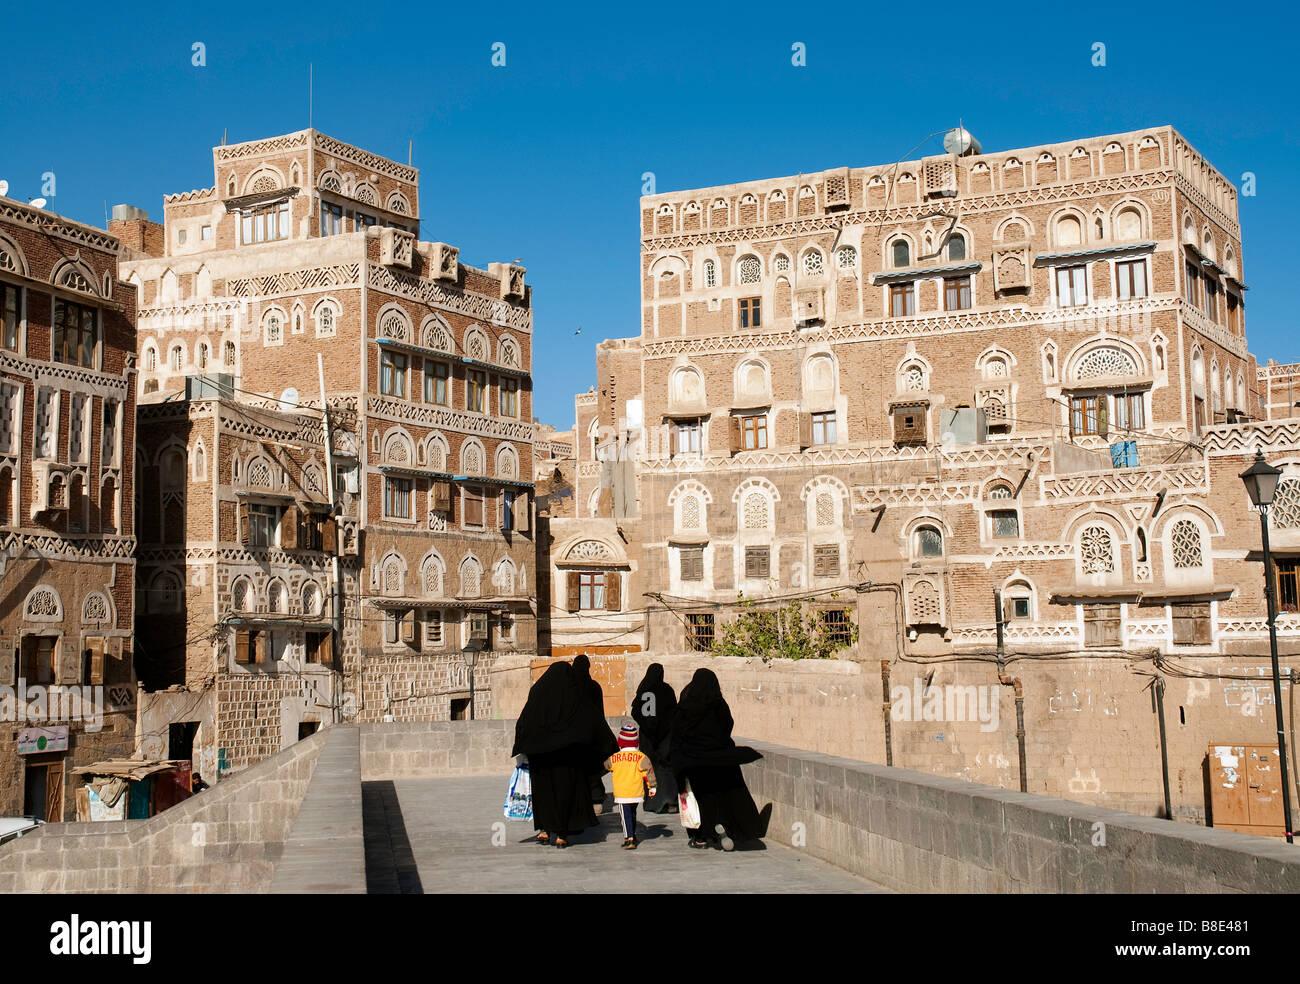 sanaa old town city yemen traditional architecture arabic - Stock Image